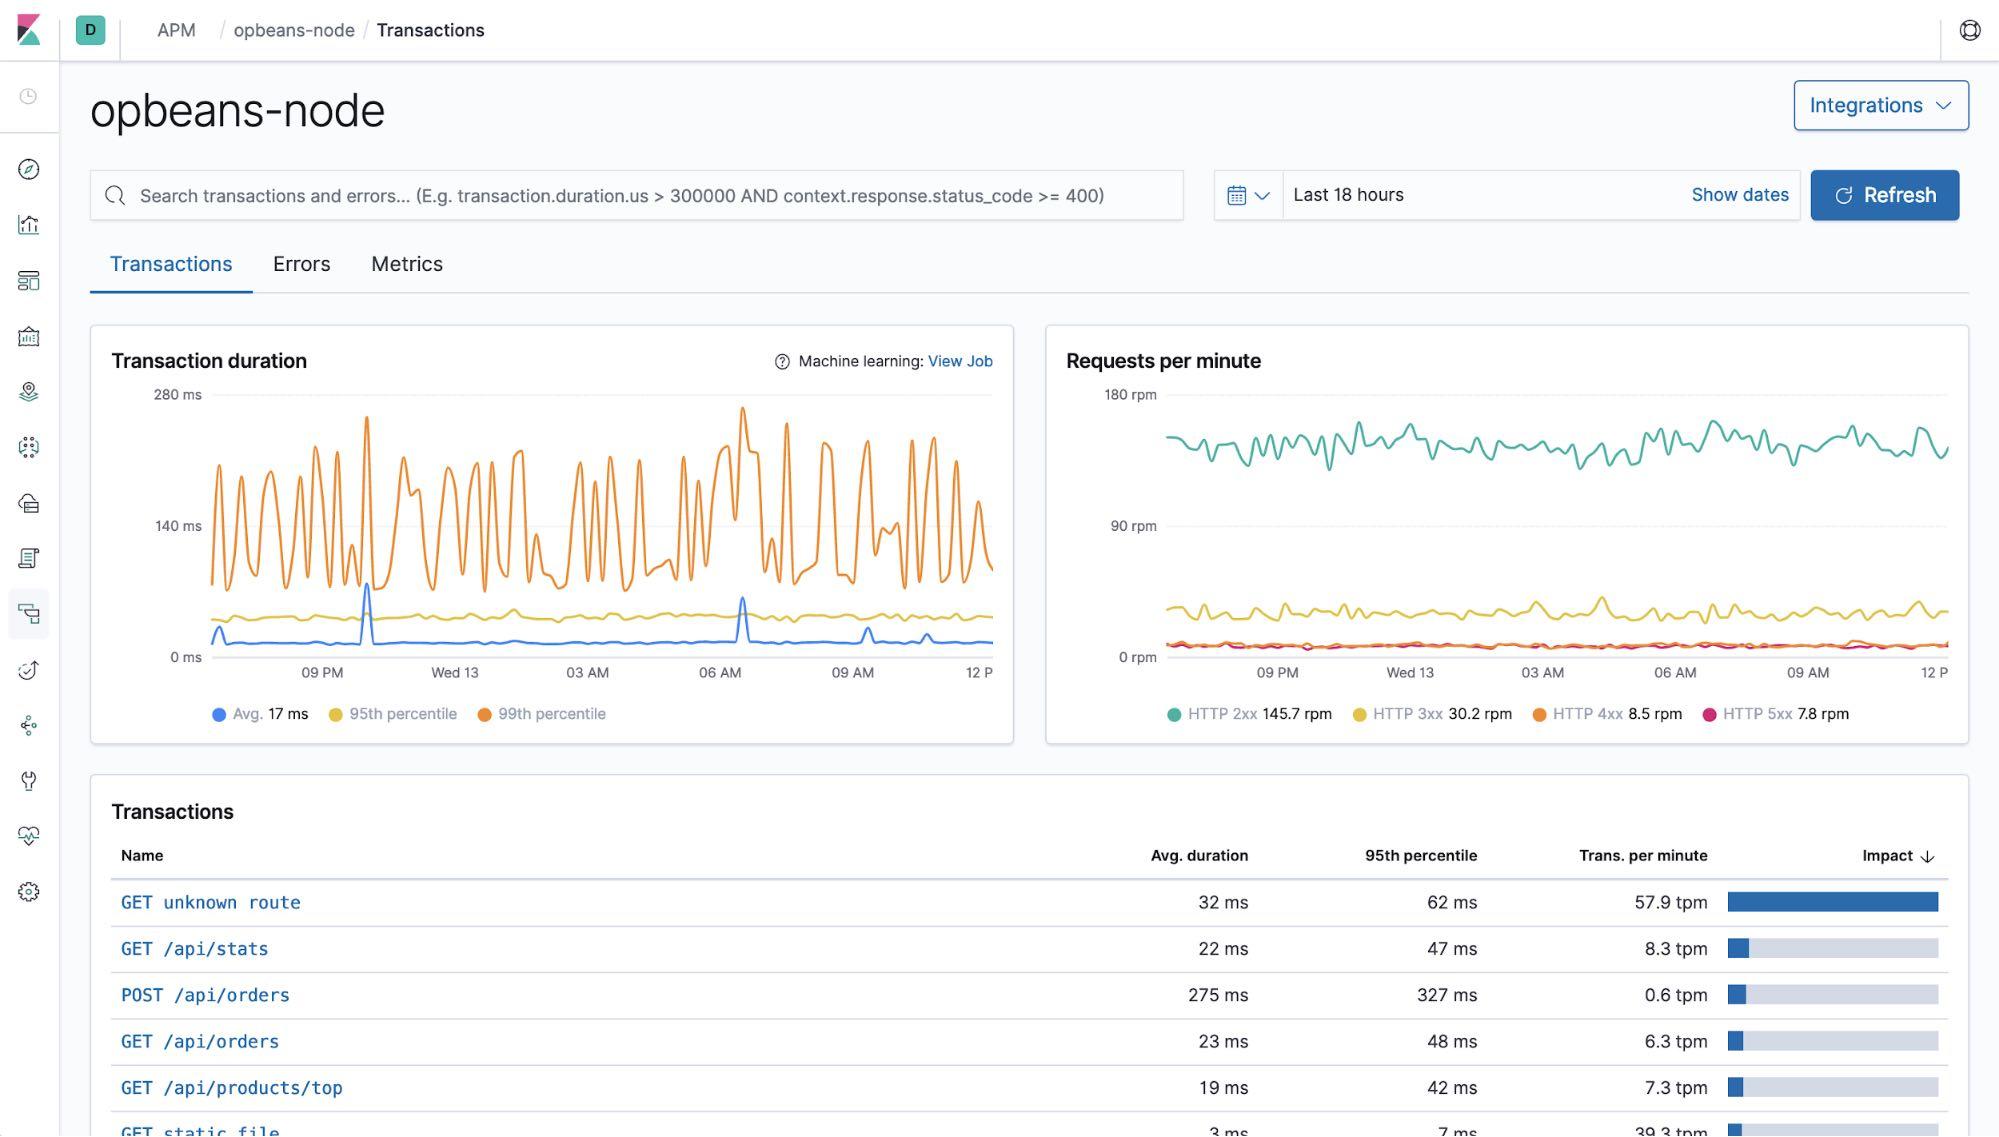 APM dashboard showing transaction graphs